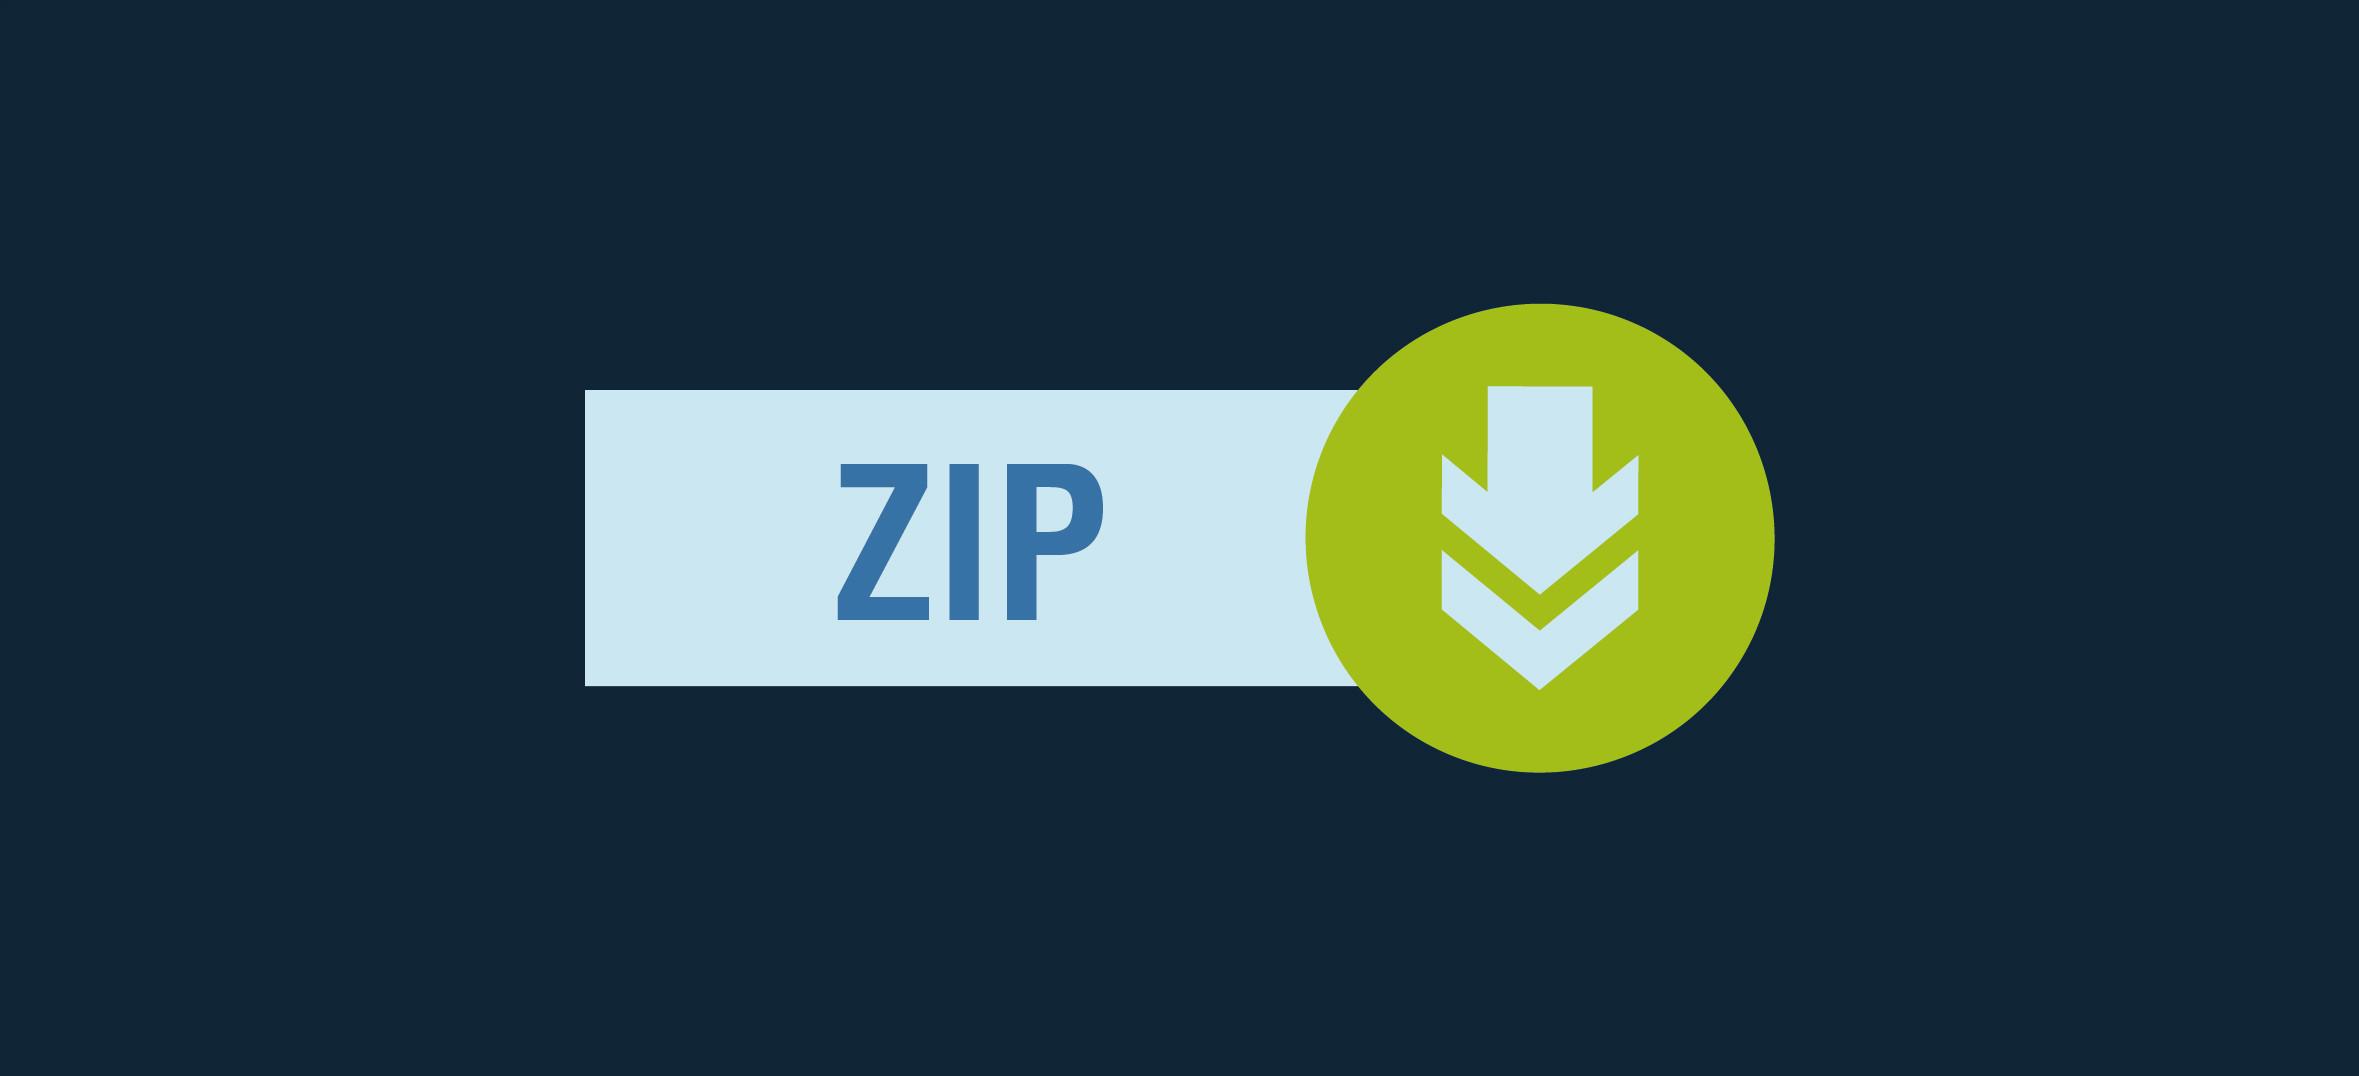 ZIP - NeuroCheck - Bildstapelaufnahme Beispielprojekt (Foto © NeuroCheck)